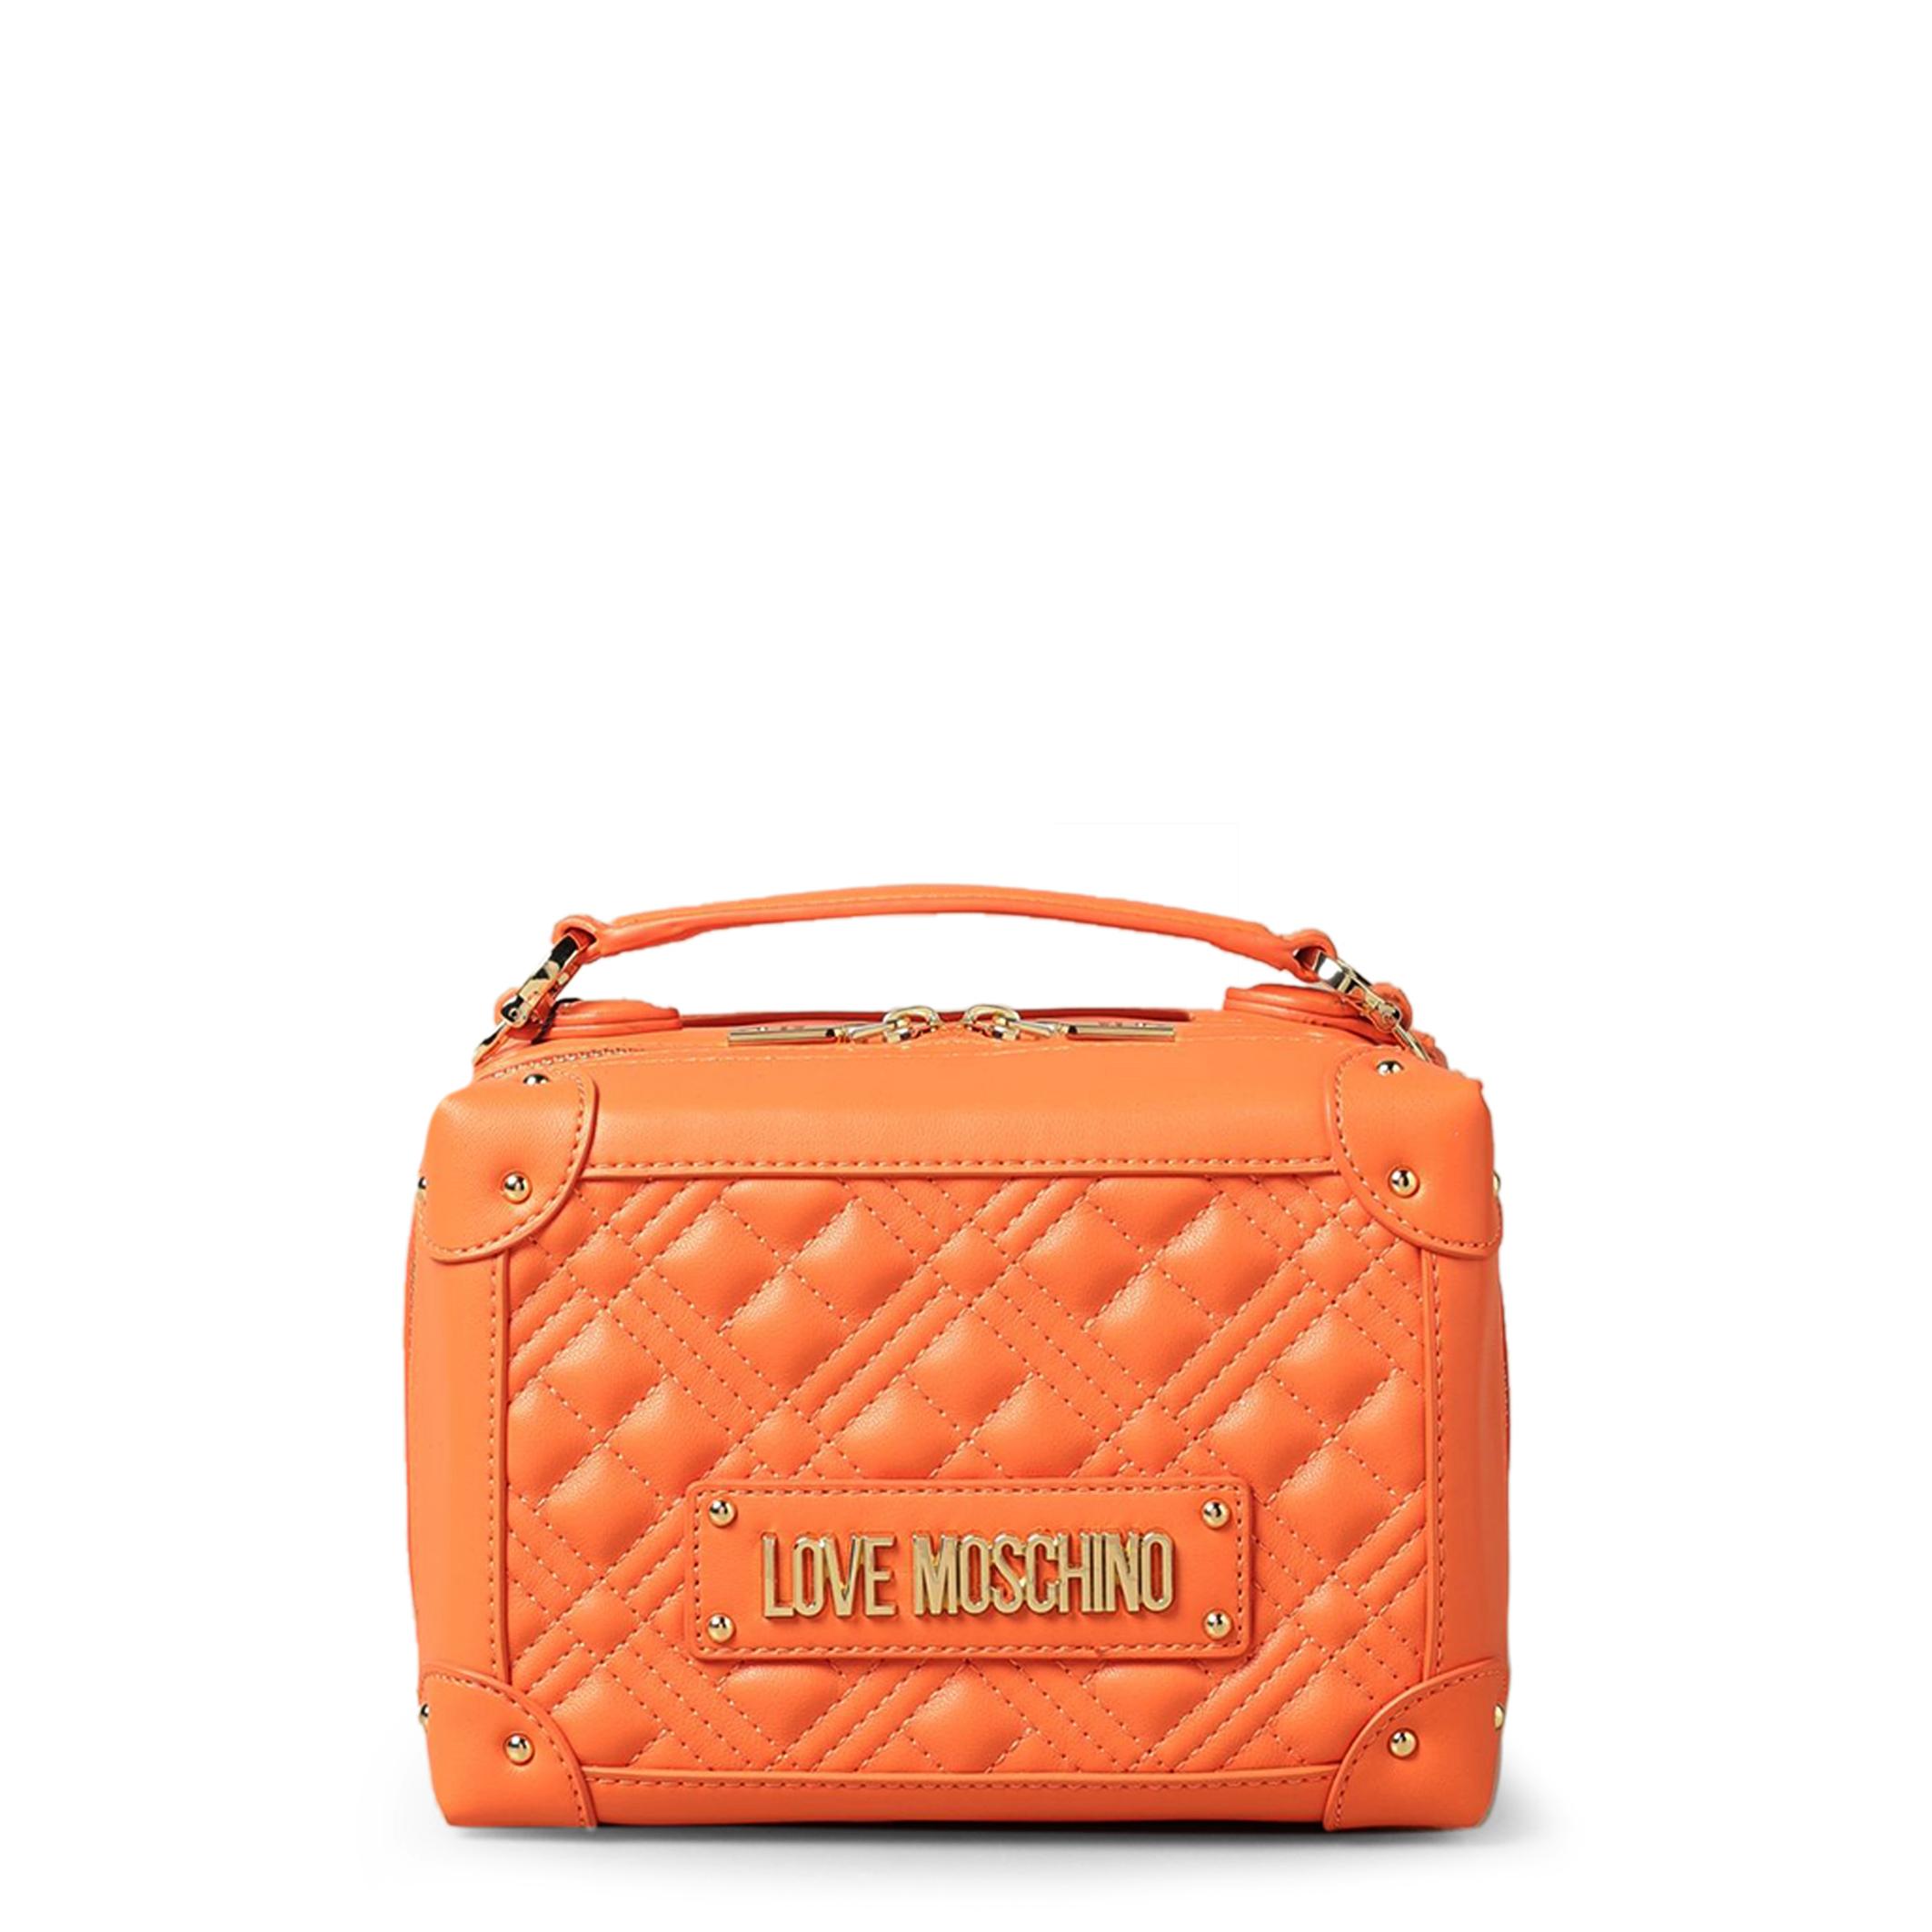 Love Moschino – JC4204PP0CKA0 – Oranje Designeritems.nl